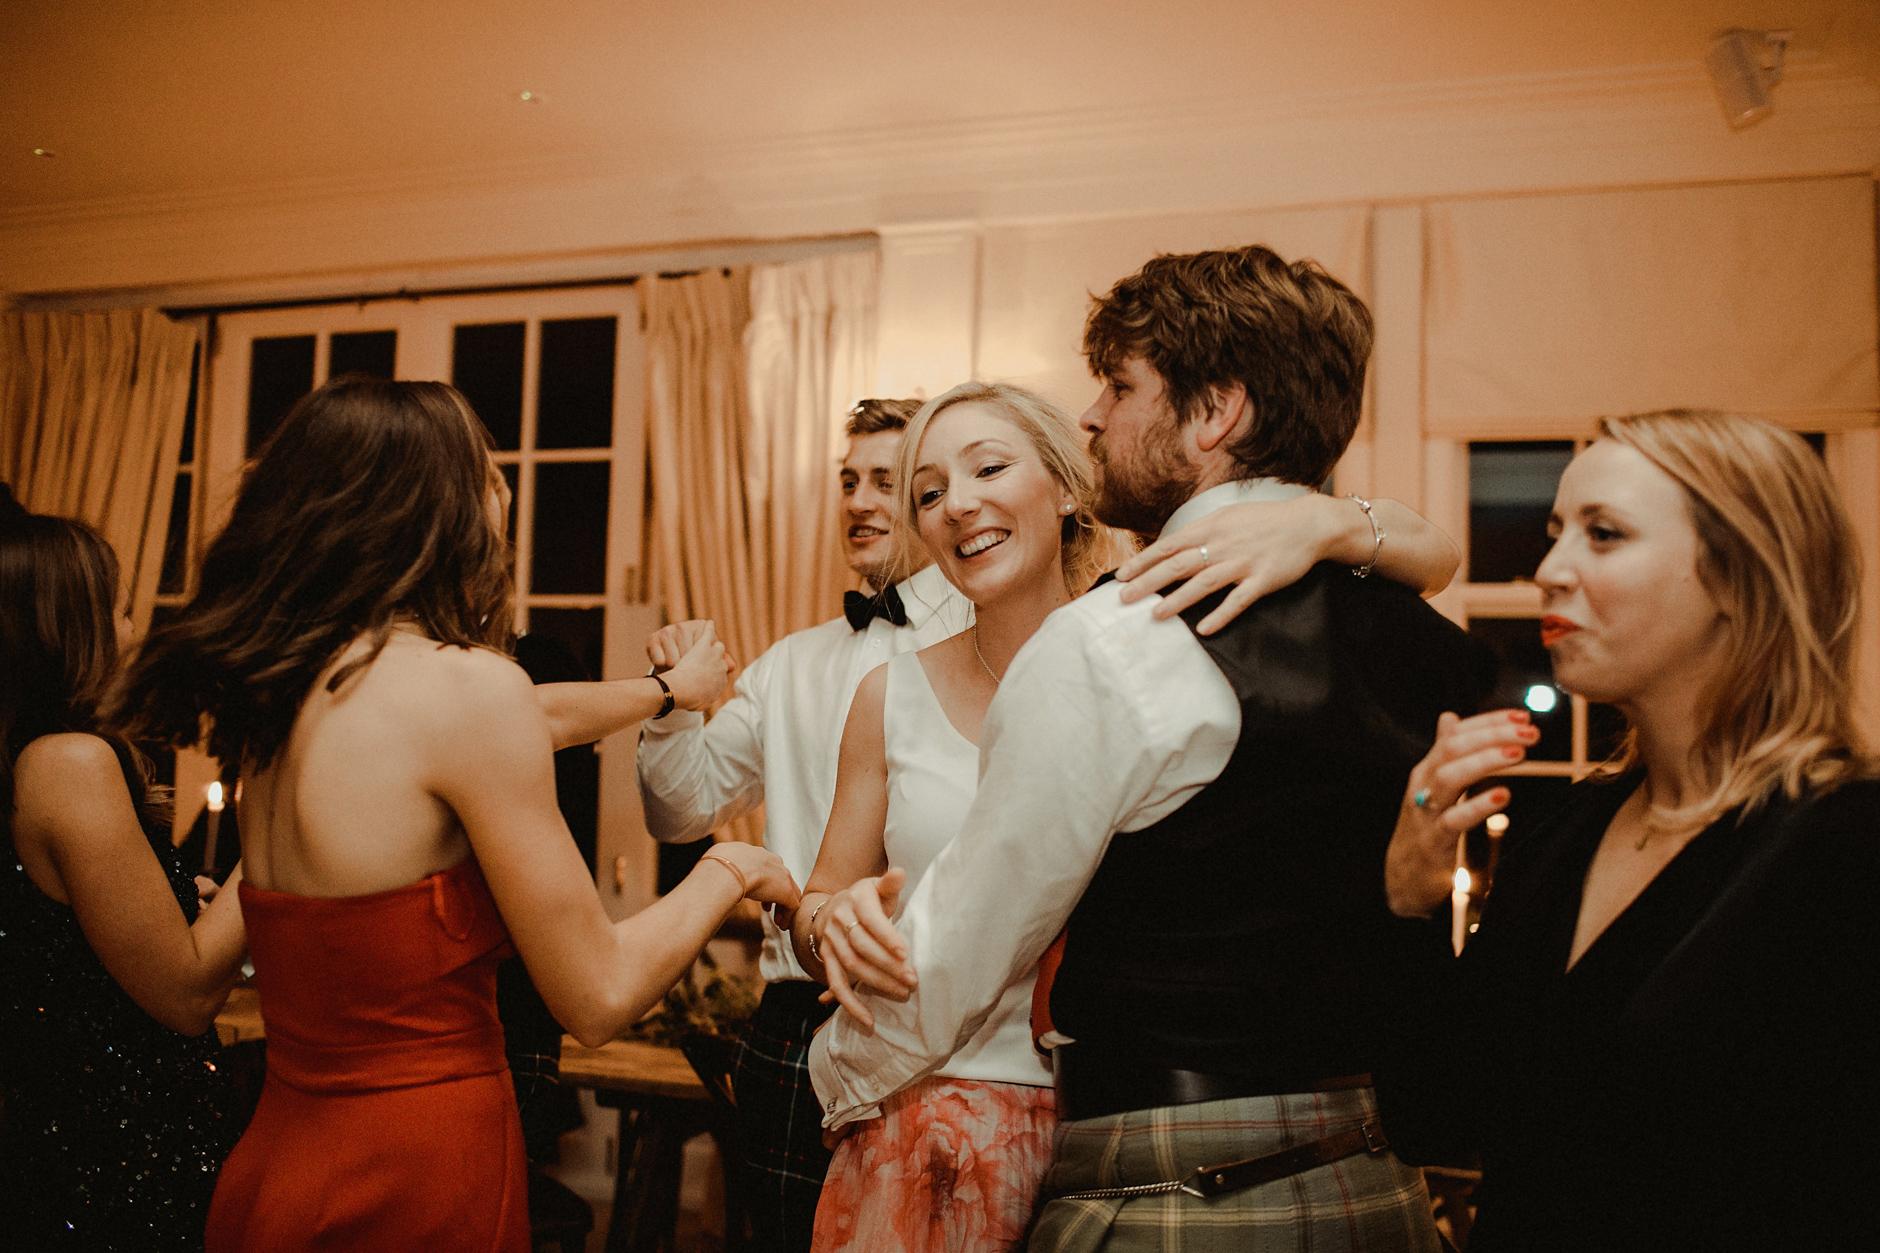 Glentruim-Wedding-Nikki-Leadbetter-Photography-381.jpg